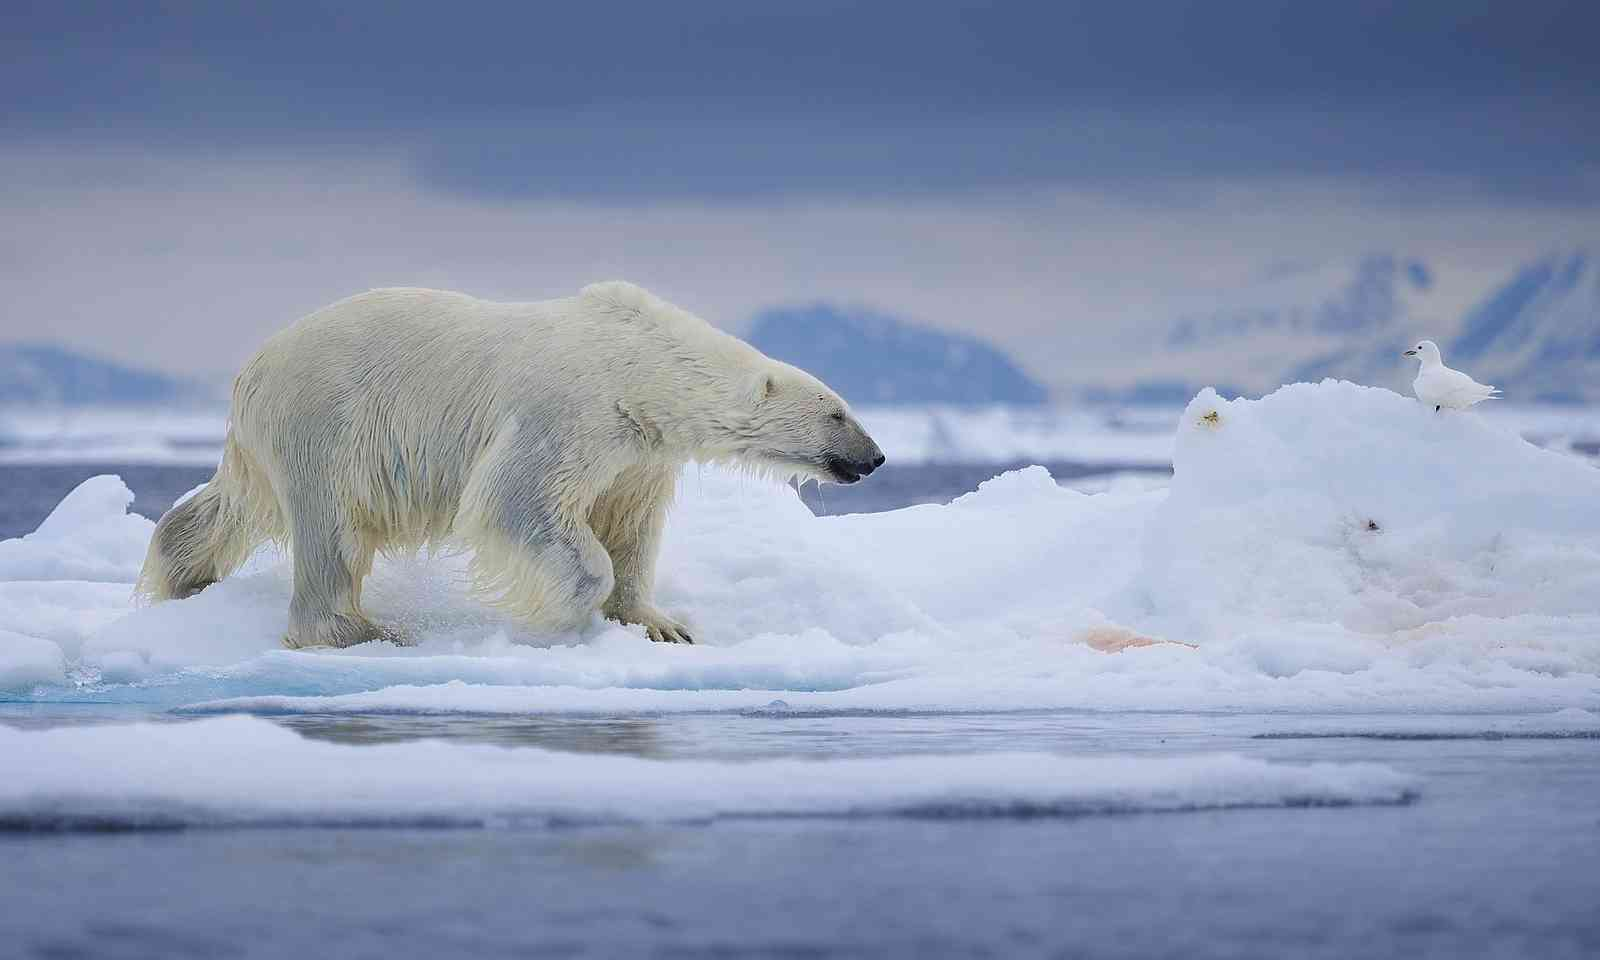 Polar bear after taking a dip in Svarlbad (Dreamstime)